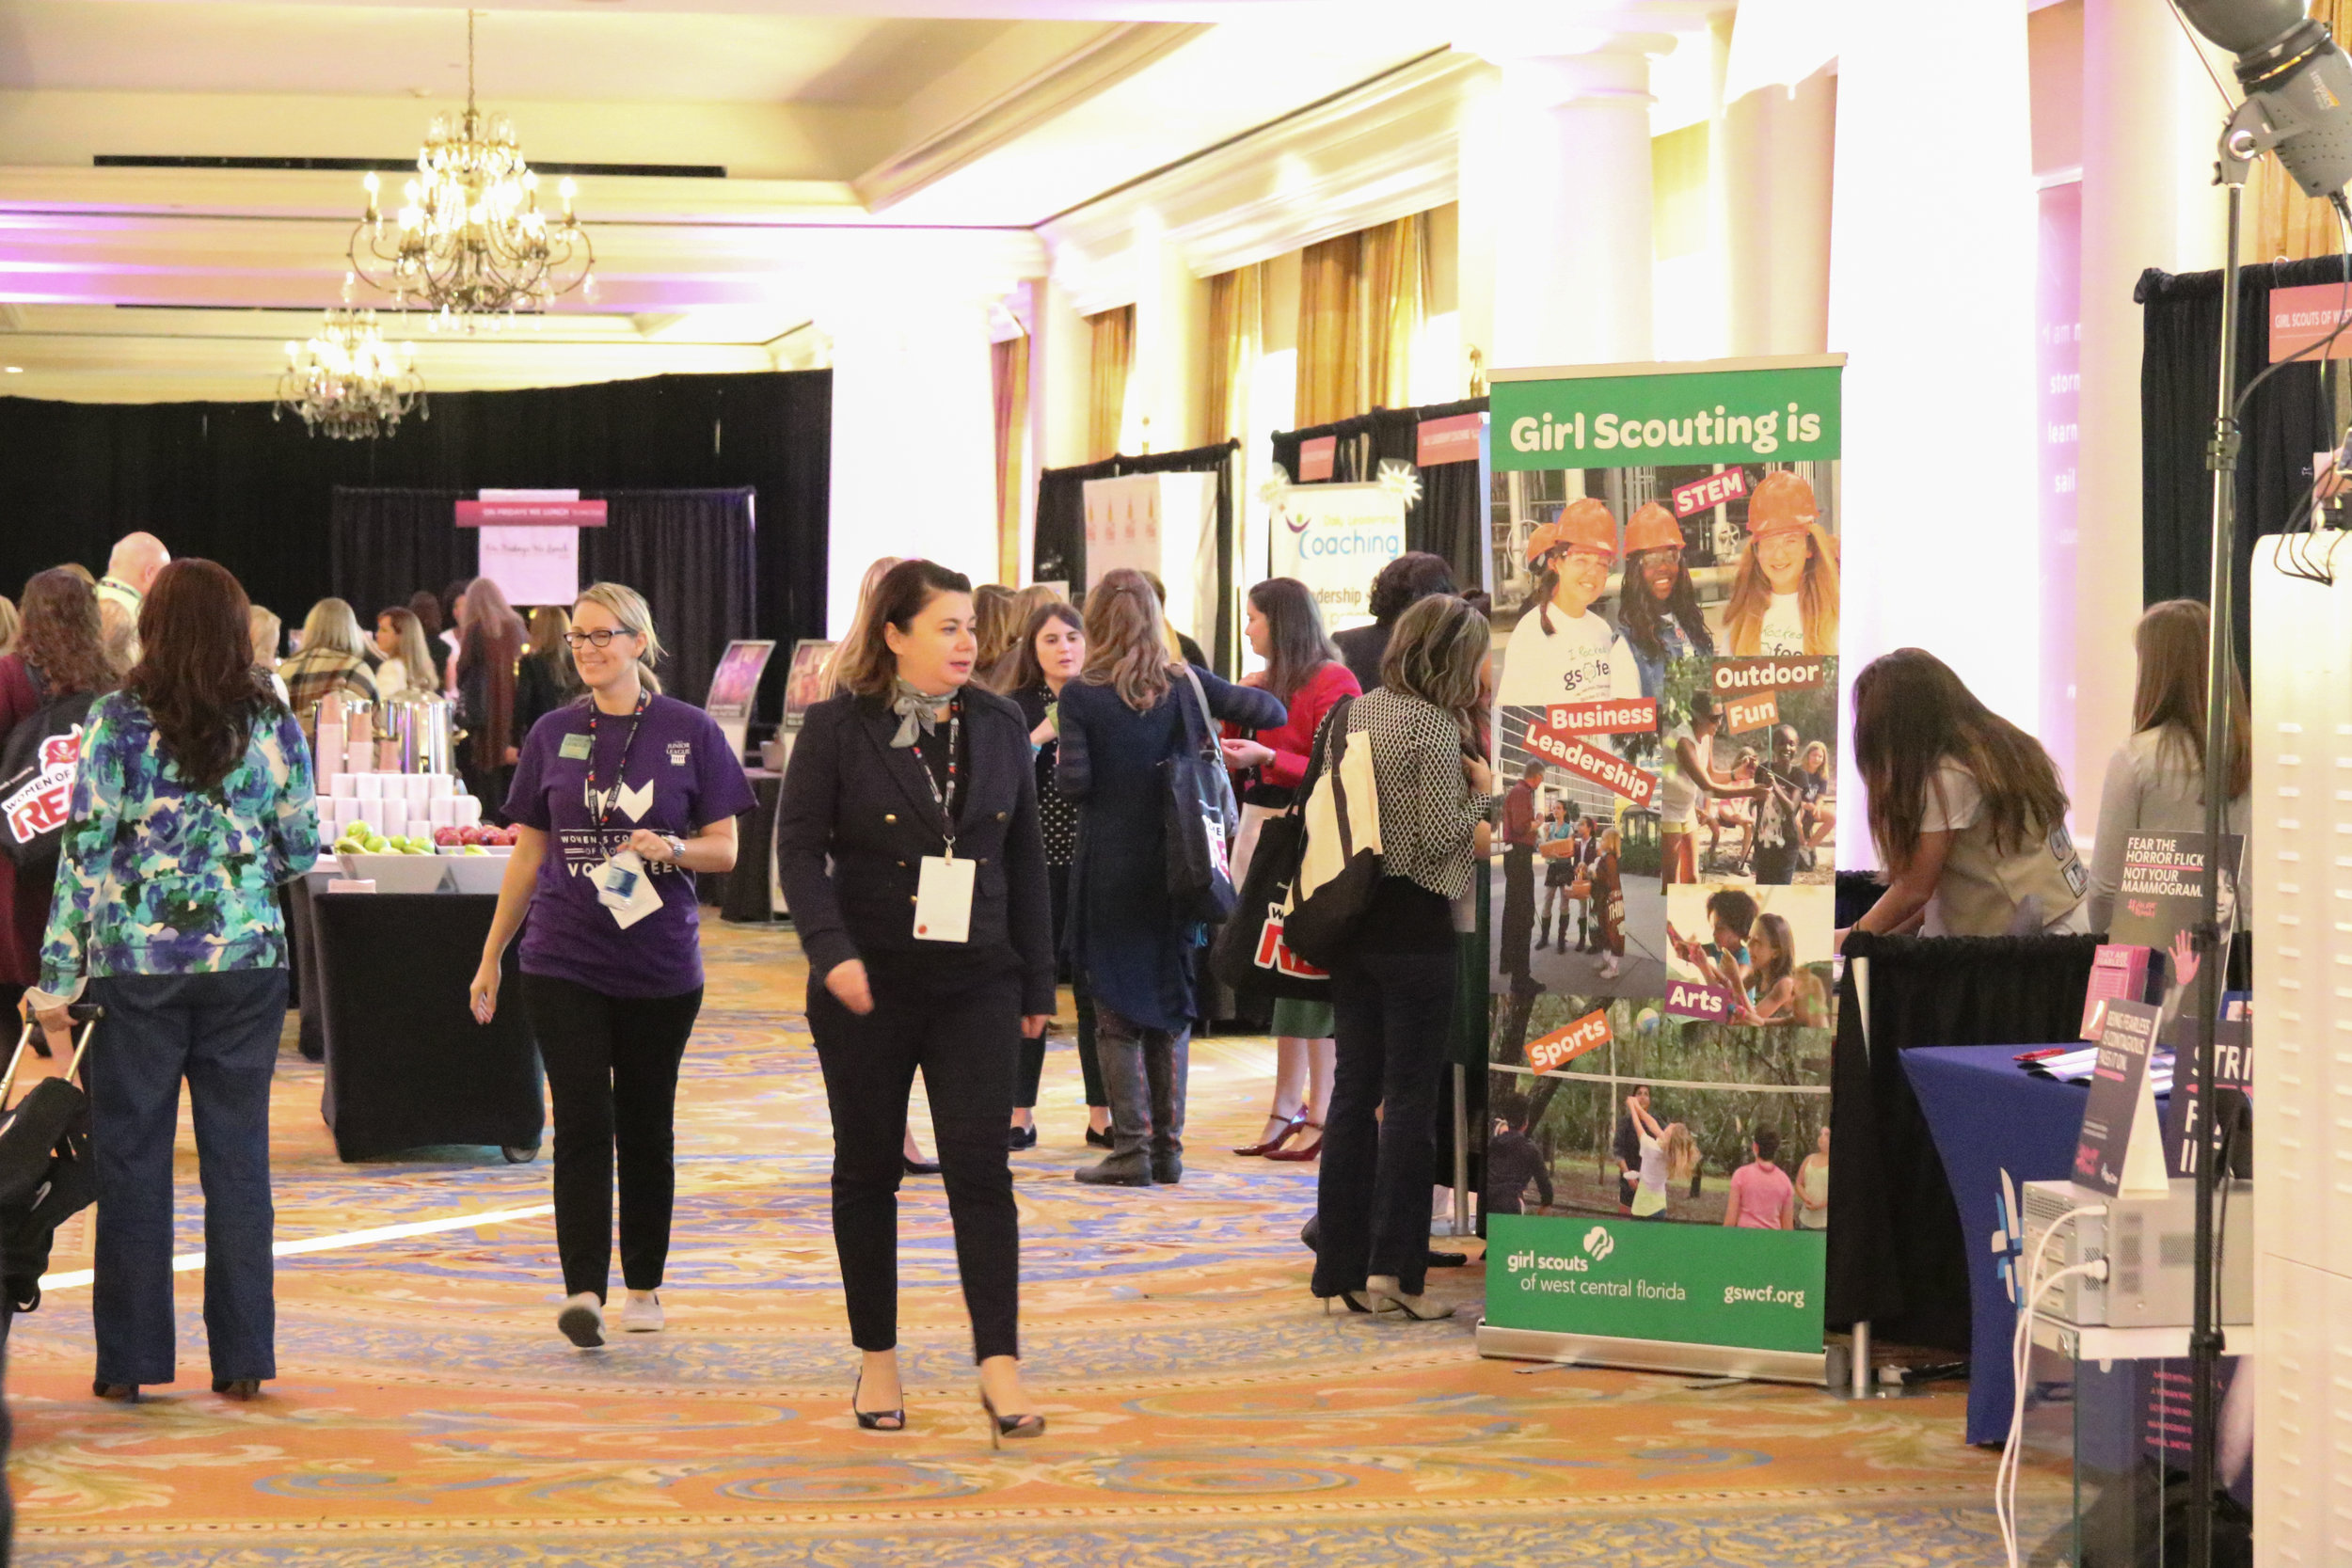 036_WomensConference_10-26-17.jpg